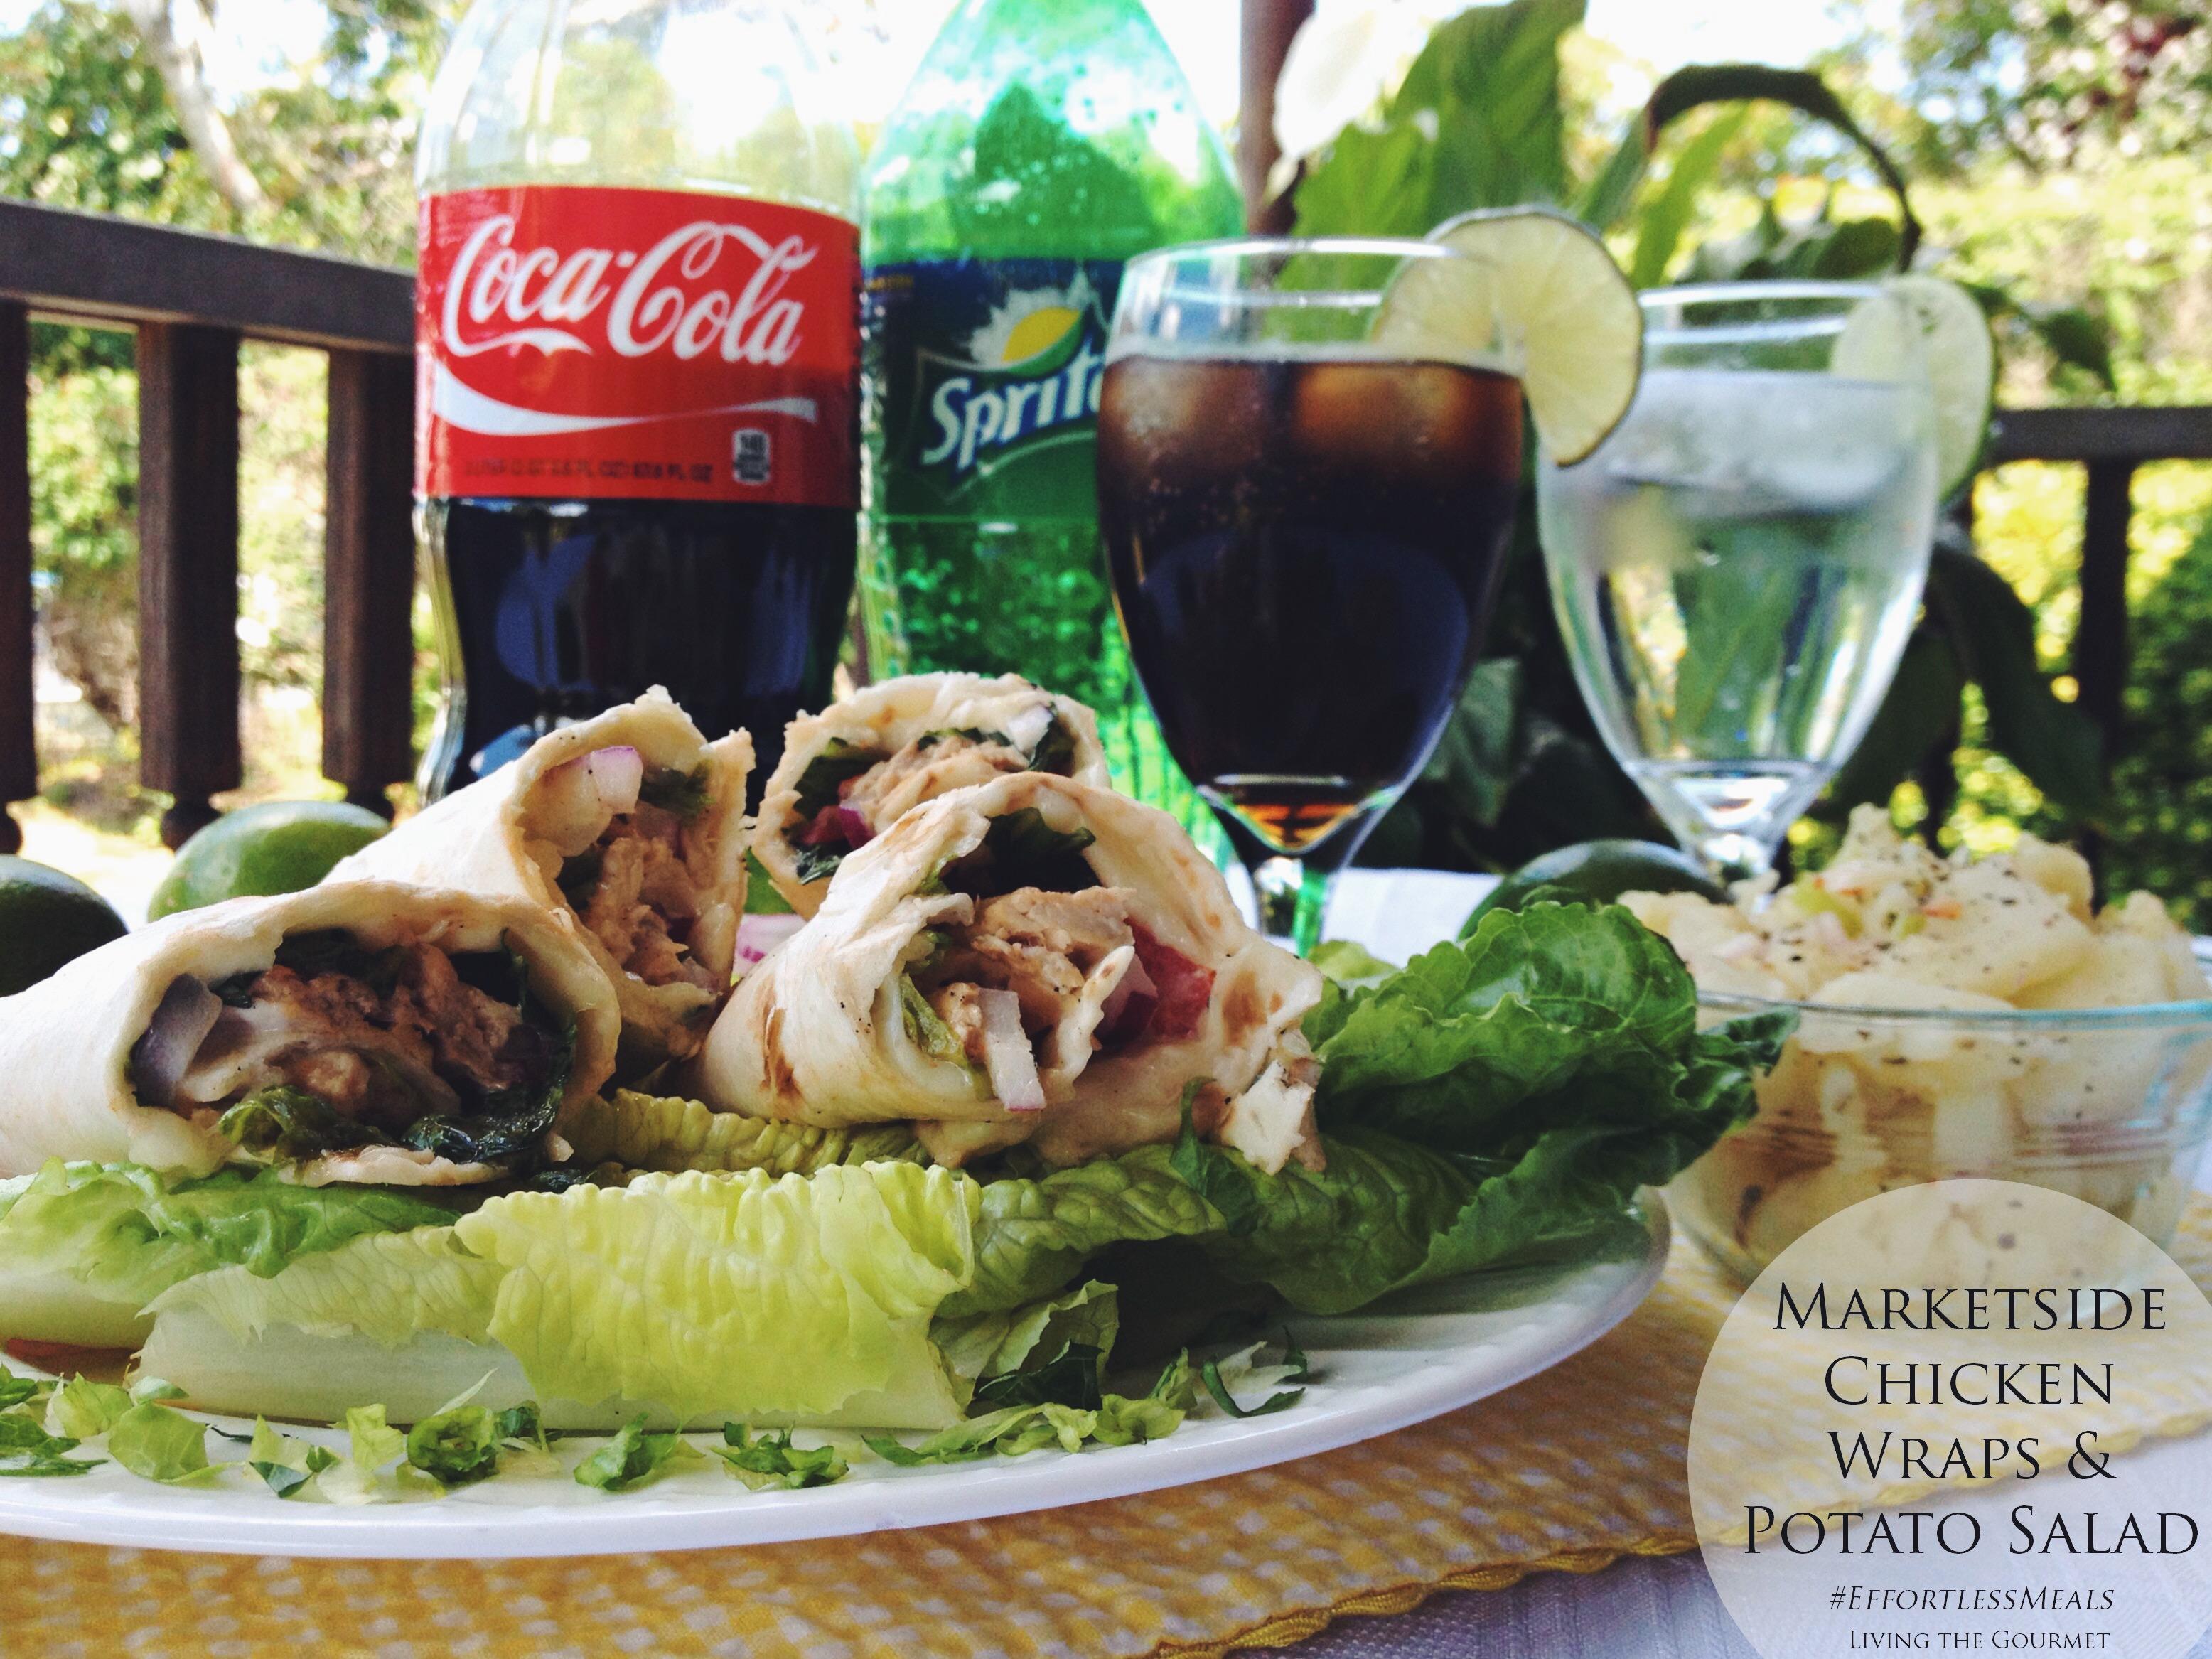 Living the Gourmet: Marketside Chicken Wraps & Potato Salad | #EffortlessMeals #Ad